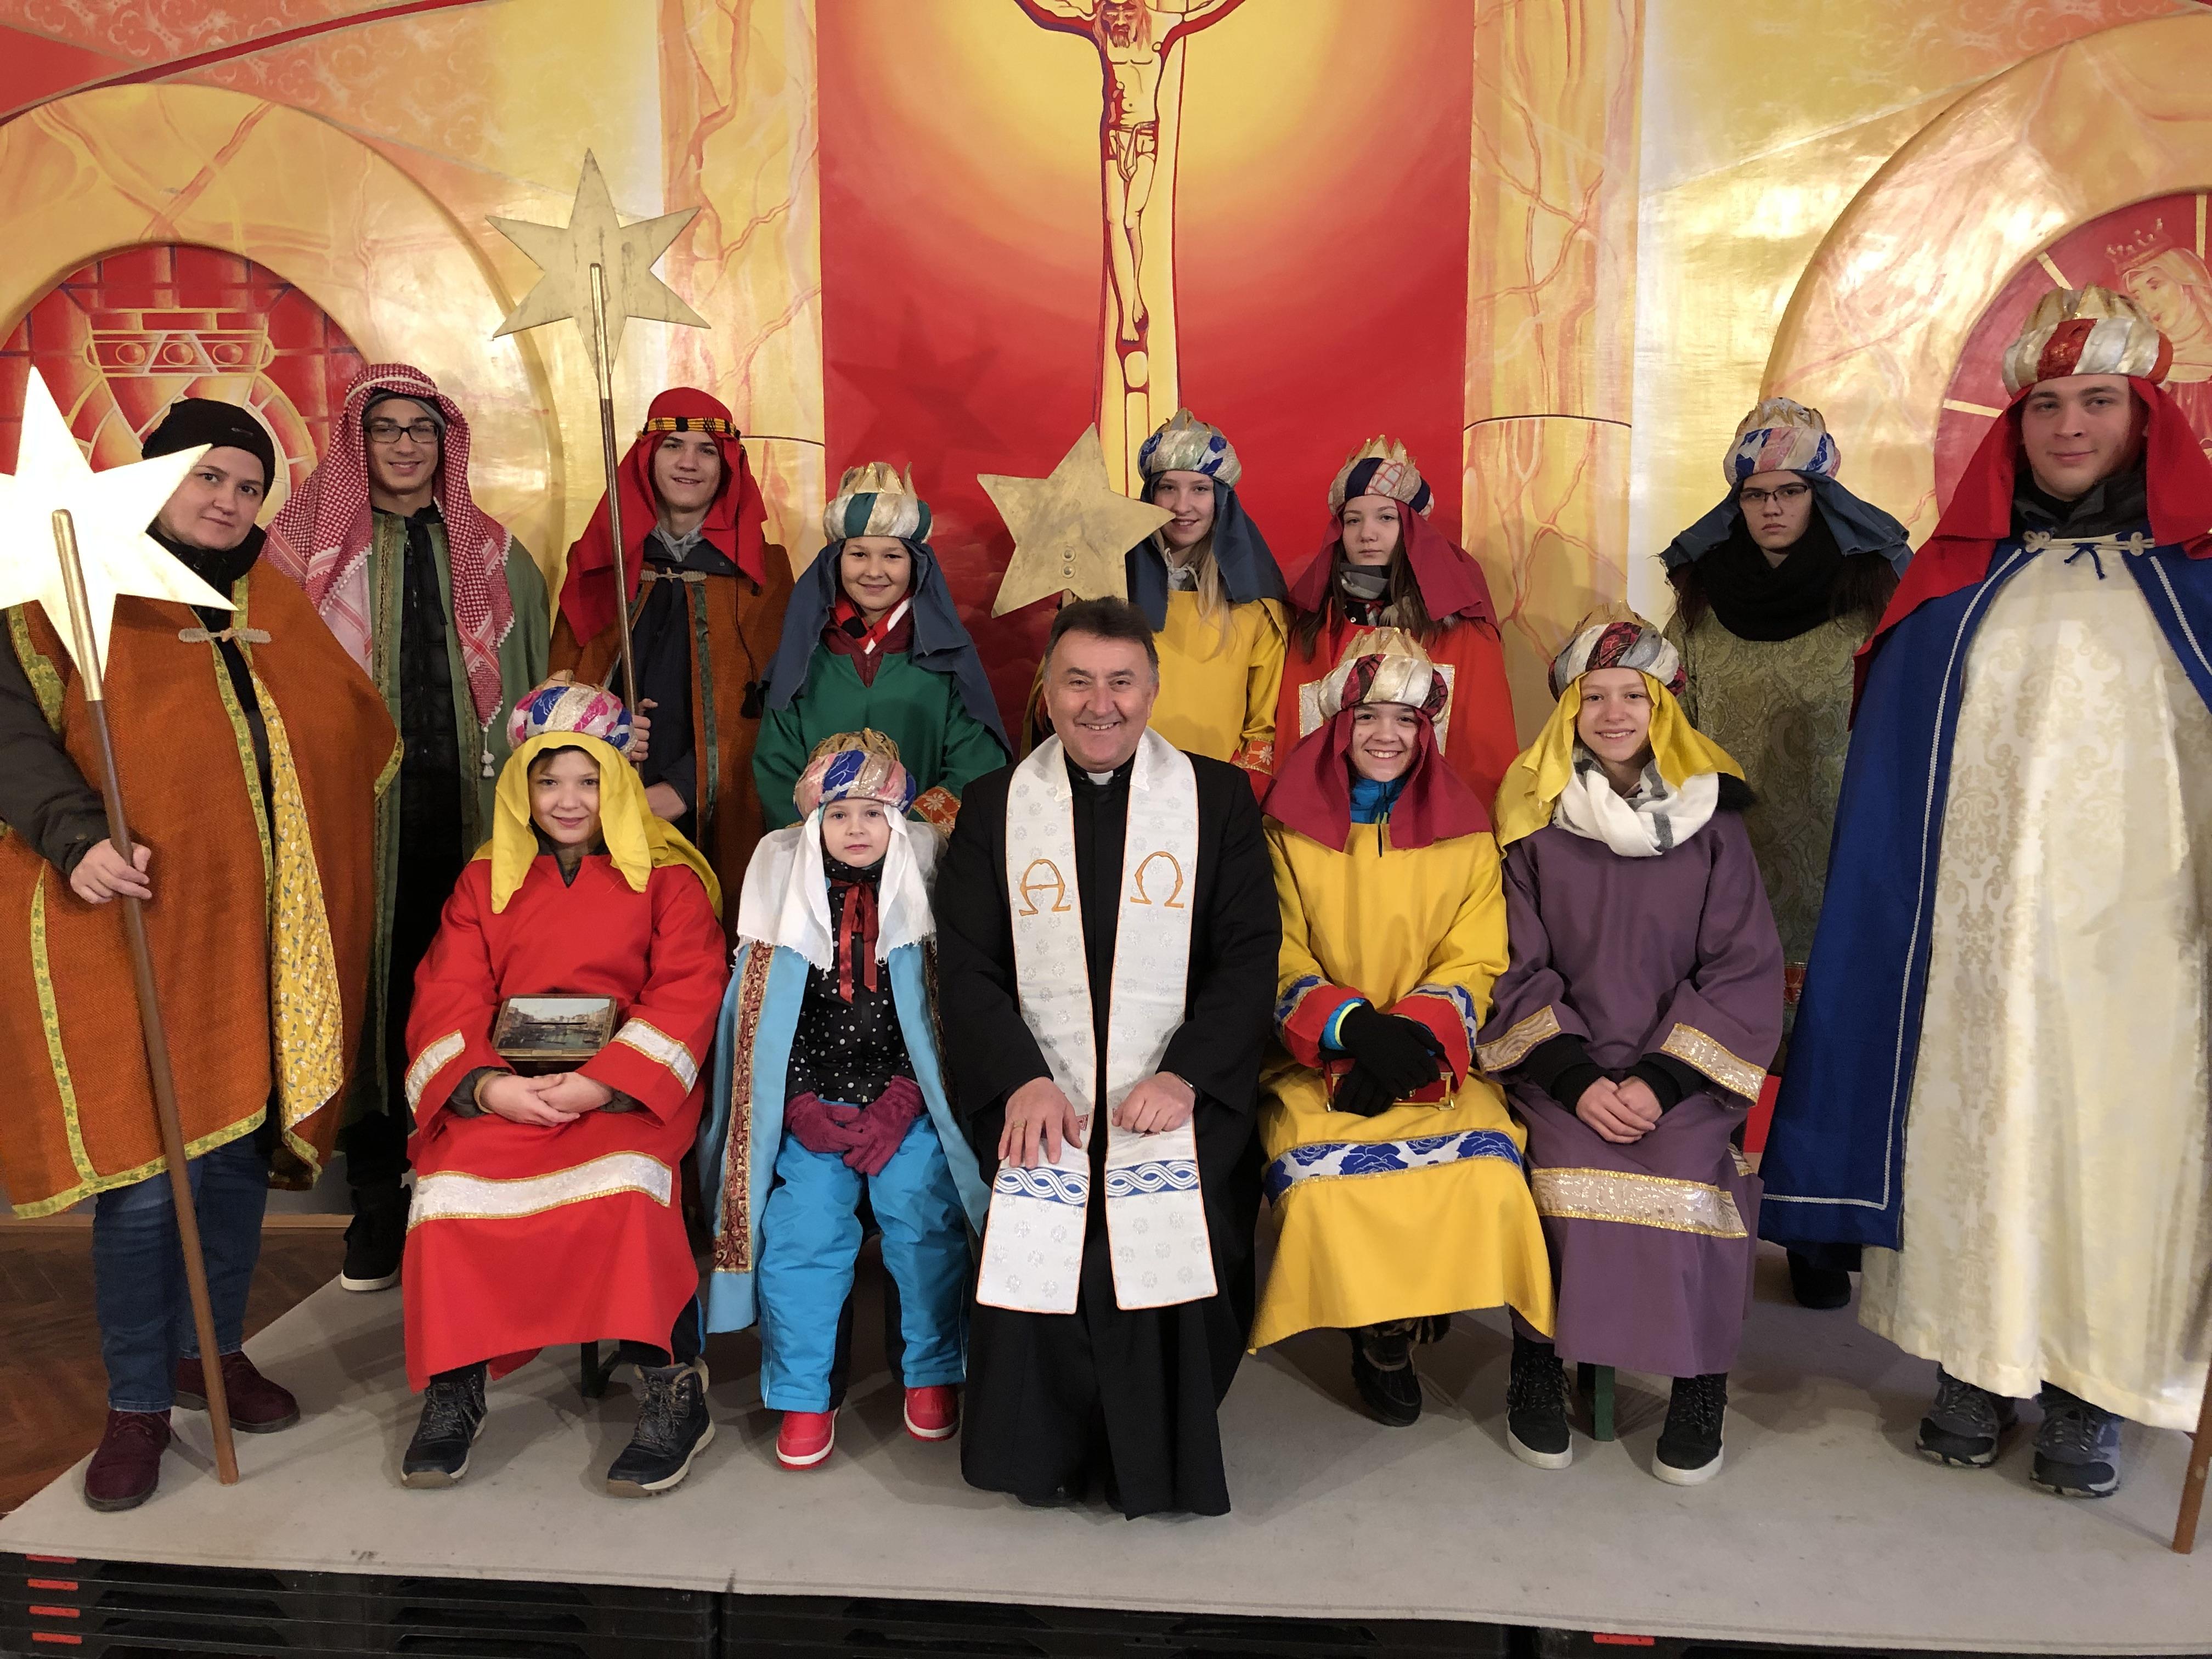 Erzdiözese Wien Sternsinger 2019